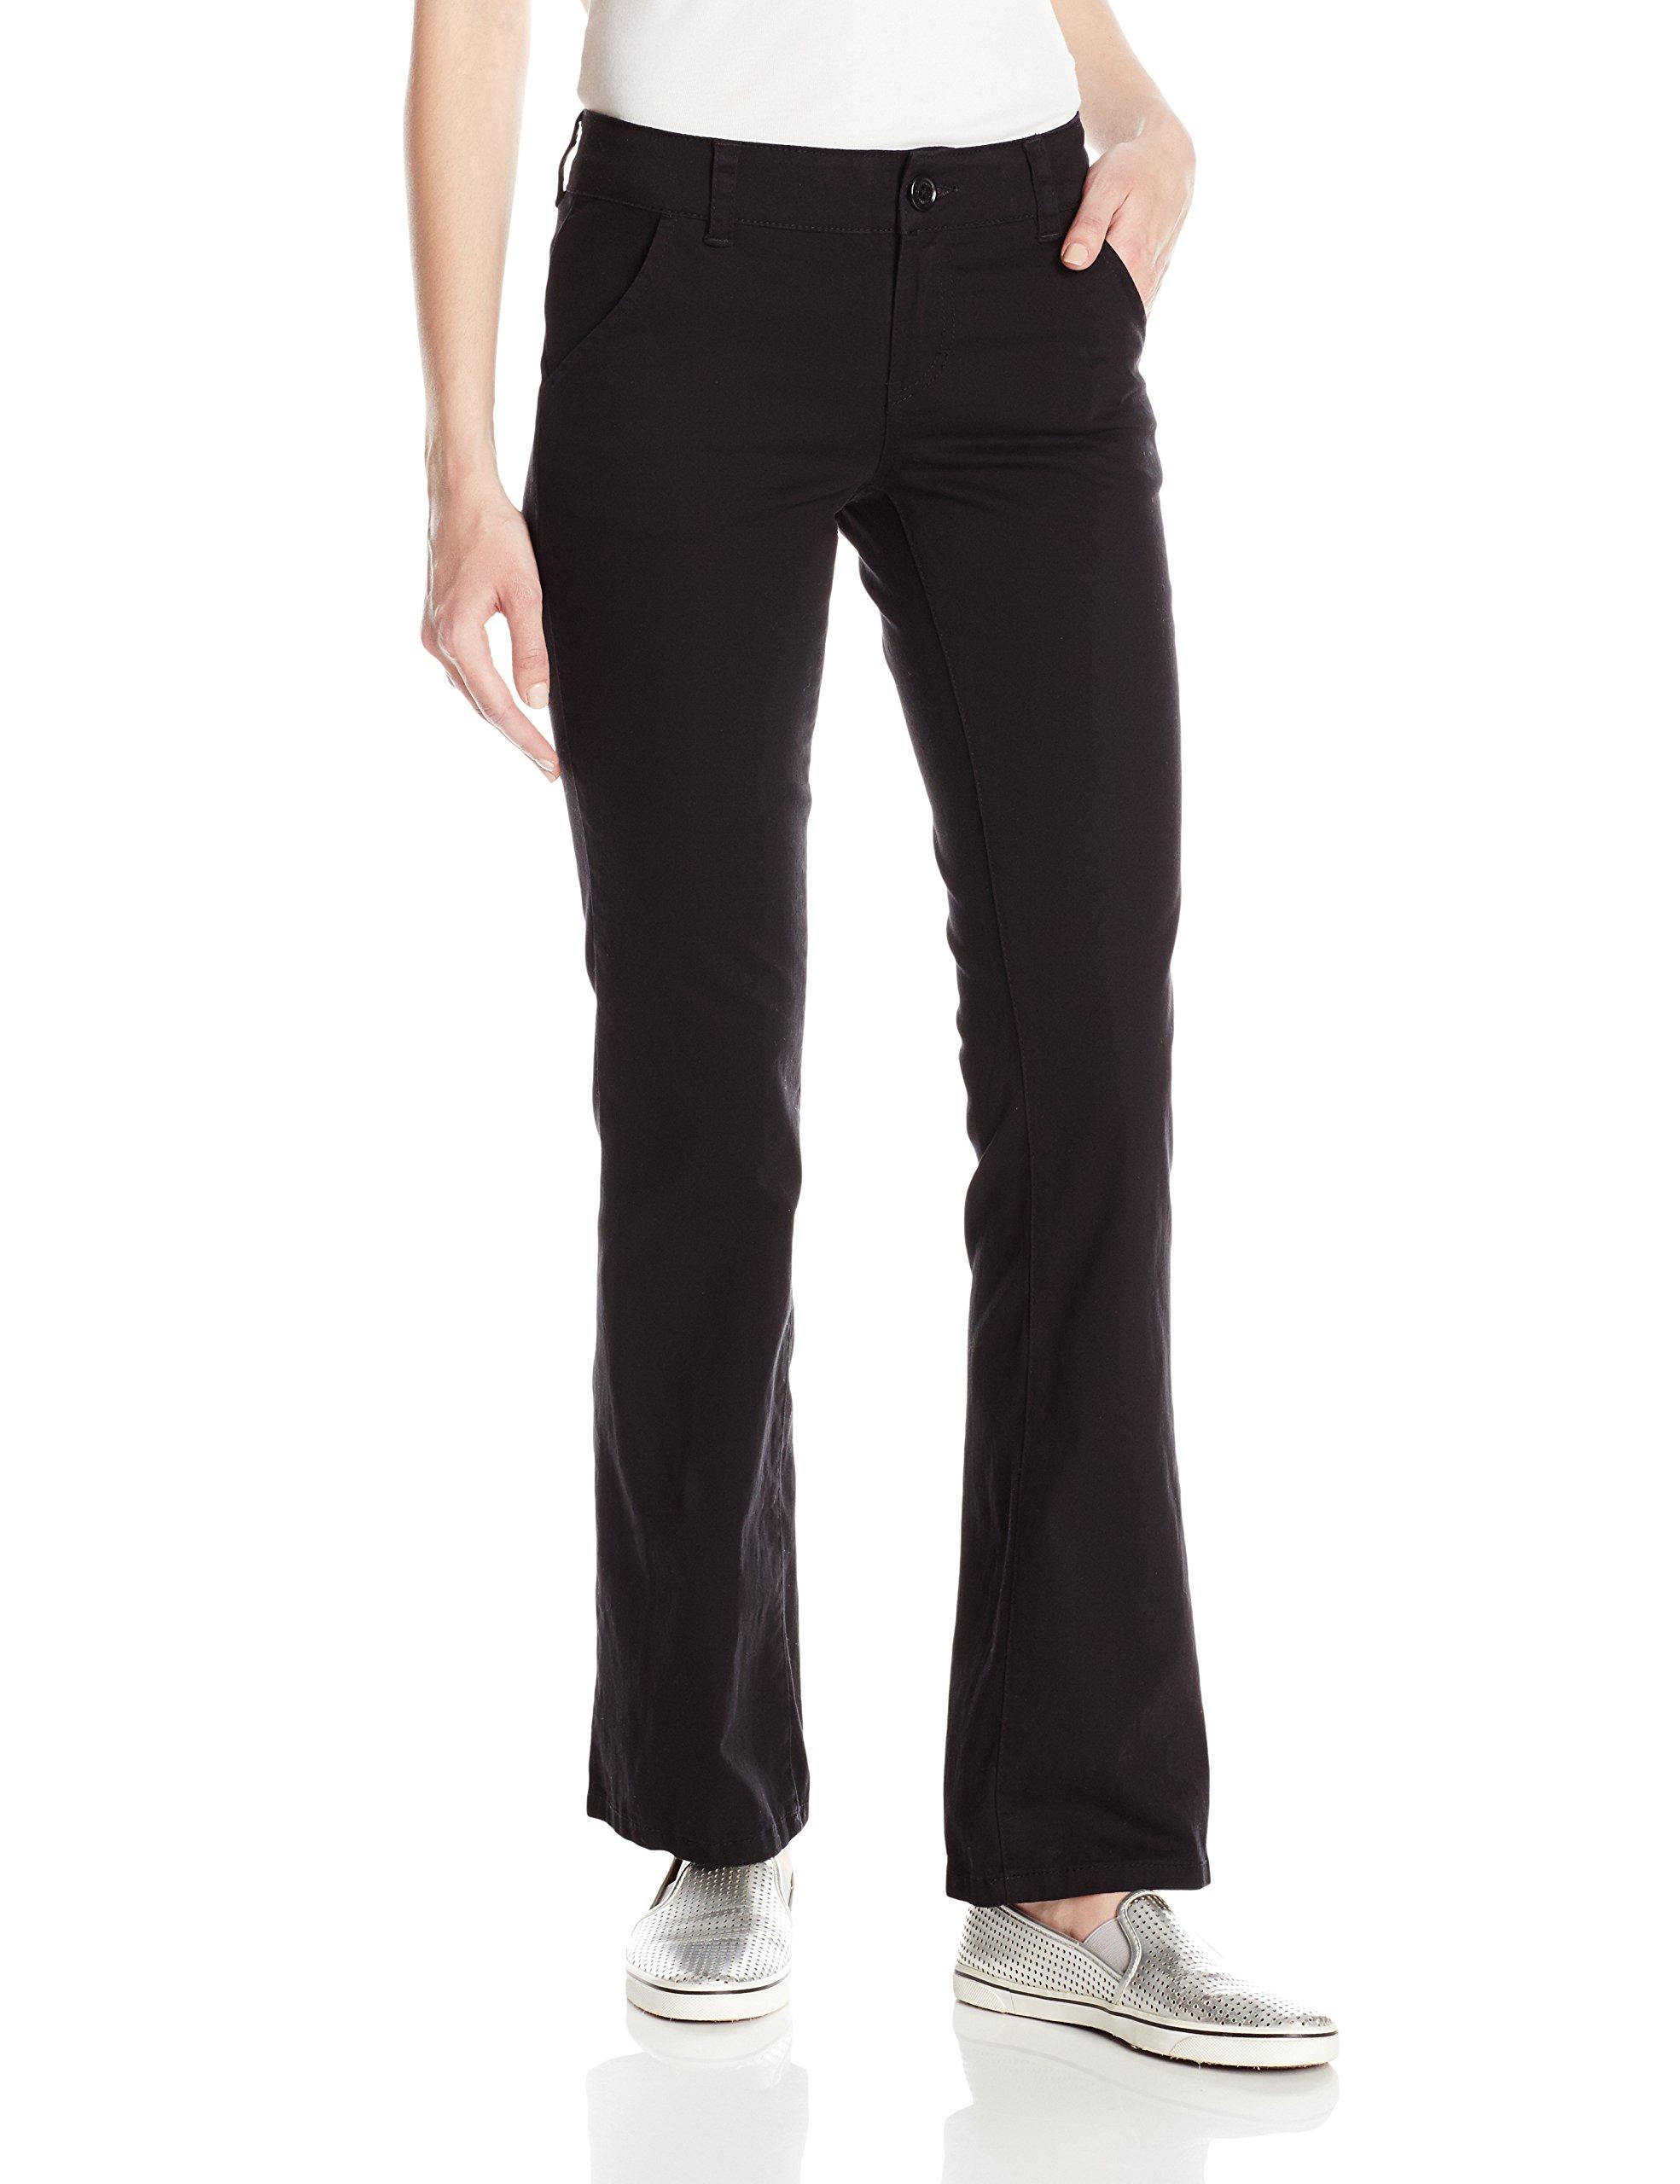 UNIONBAY Juniors Heather Slash Pocket Uniform Bootcut Pant, New Black, 13